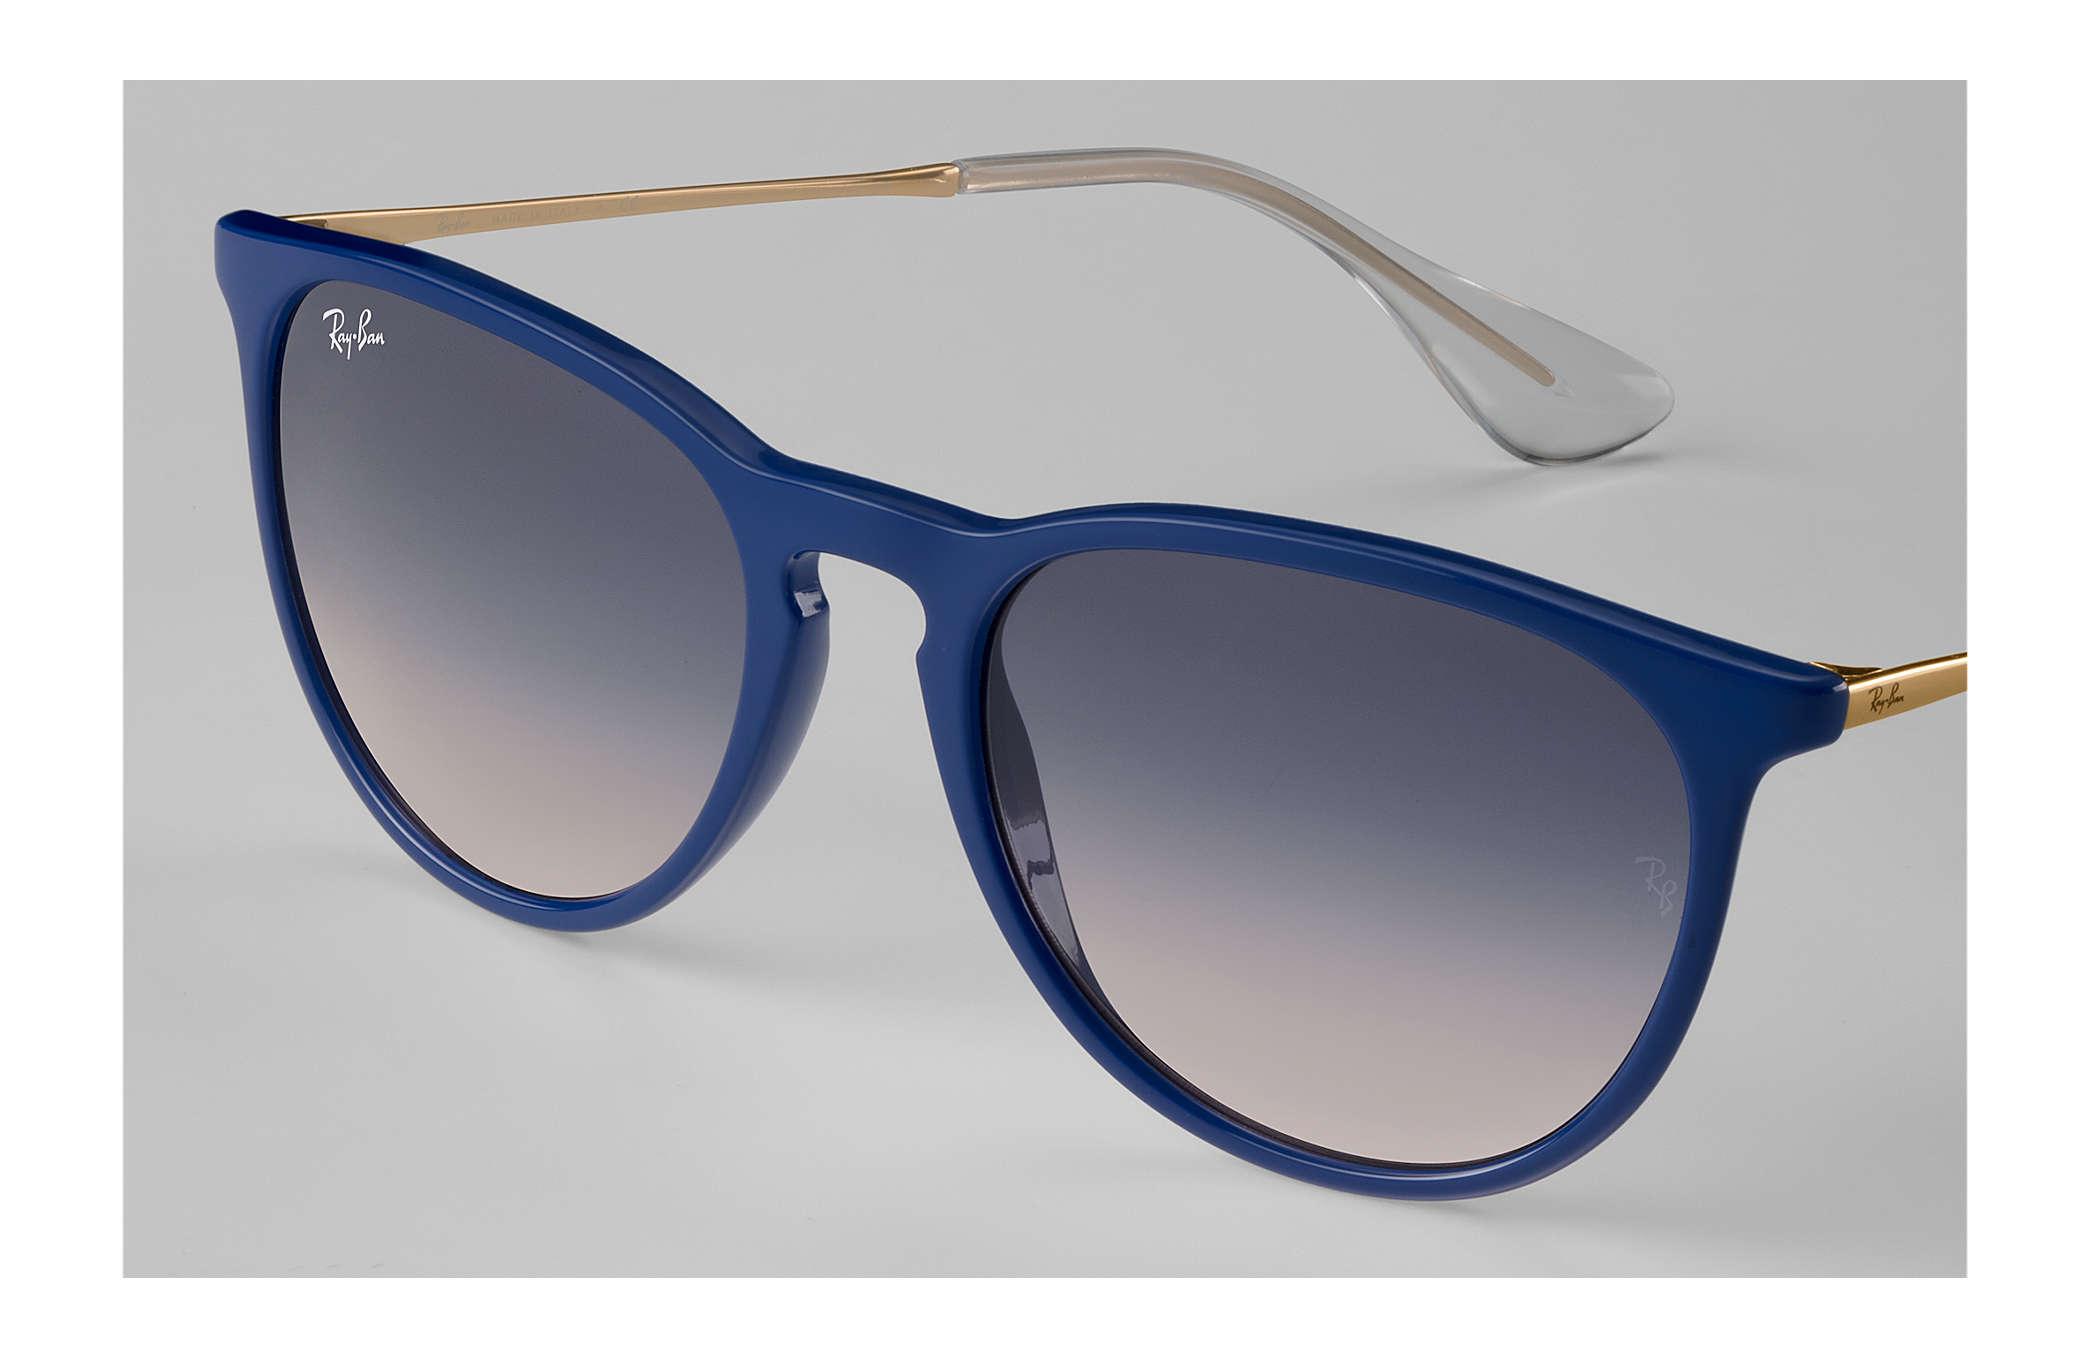 4300bfc2ba15e3 Ray-Ban Erika  collection RB4171 Blauw - Nylon - Blauw Brillenglazen ...